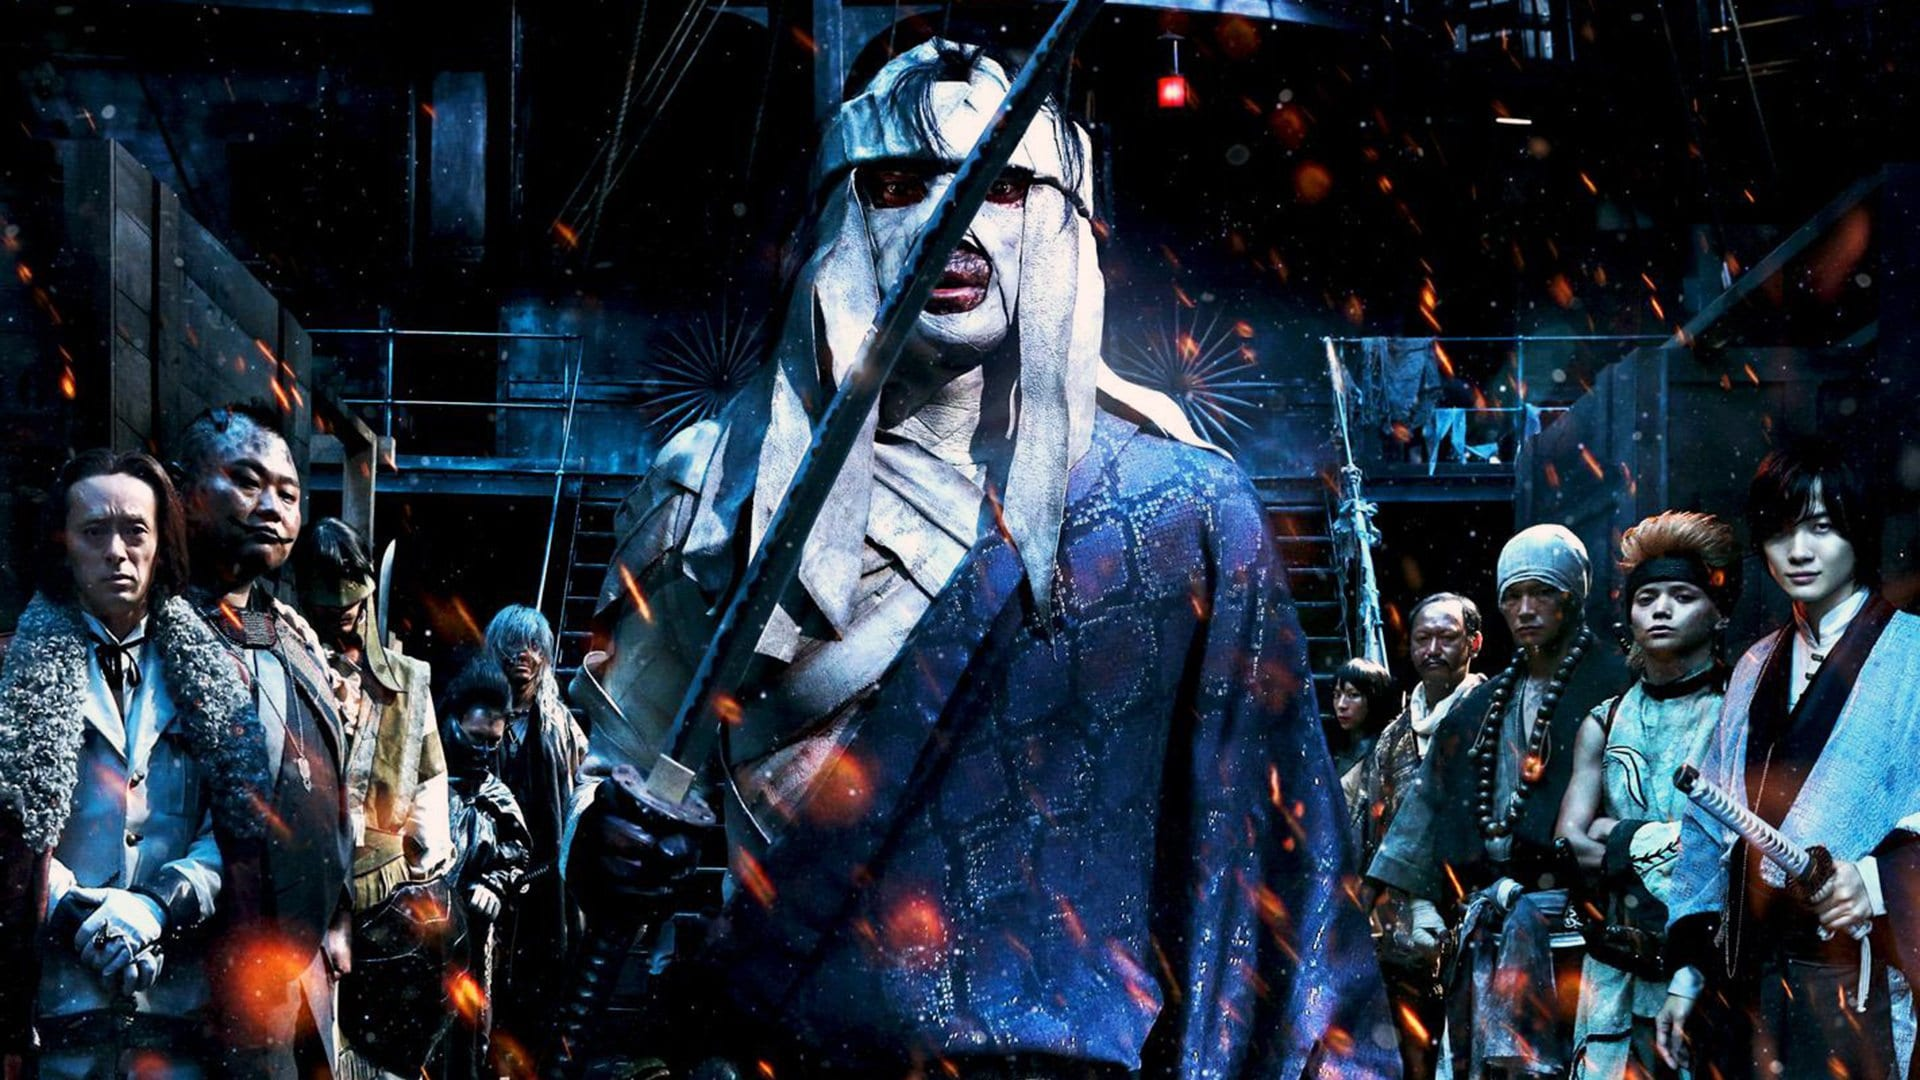 Regarder Kenshin – La fin de la Légende en streaming gratuit